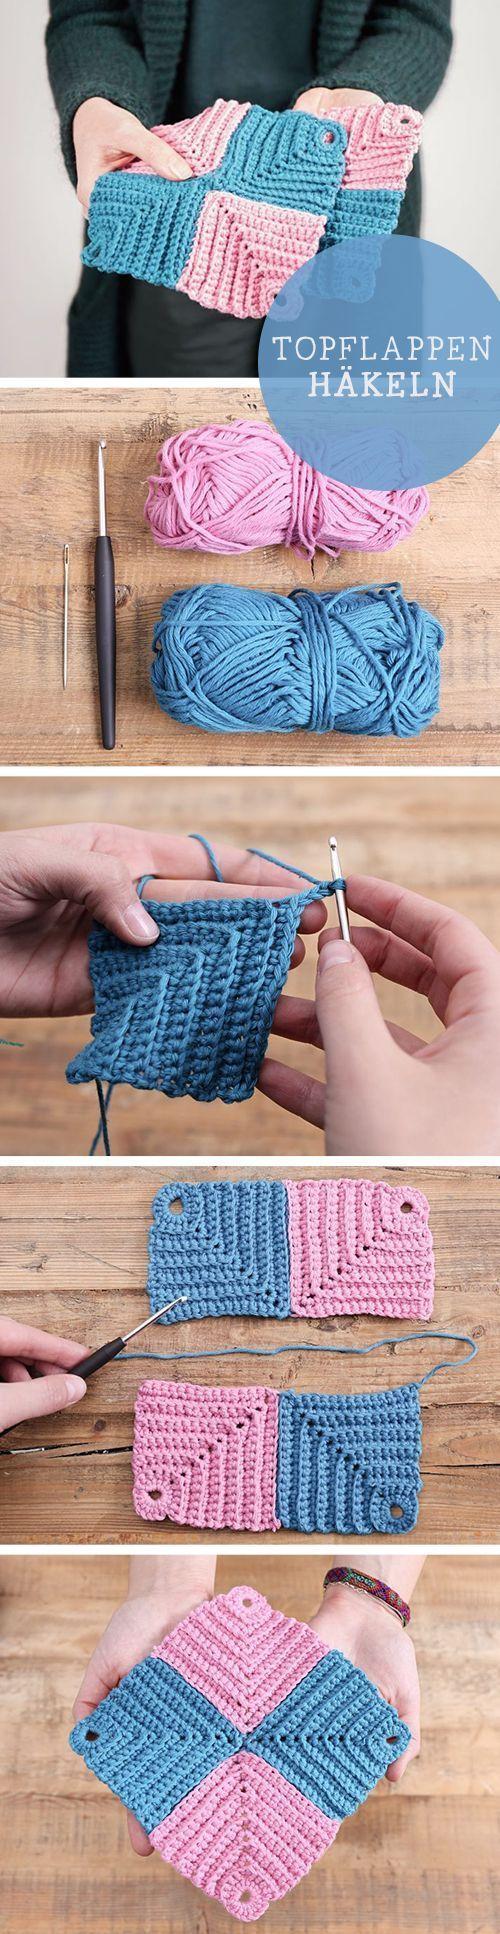 97 best Häkeln images on Pinterest | Stitching, Chrochet and Crochet